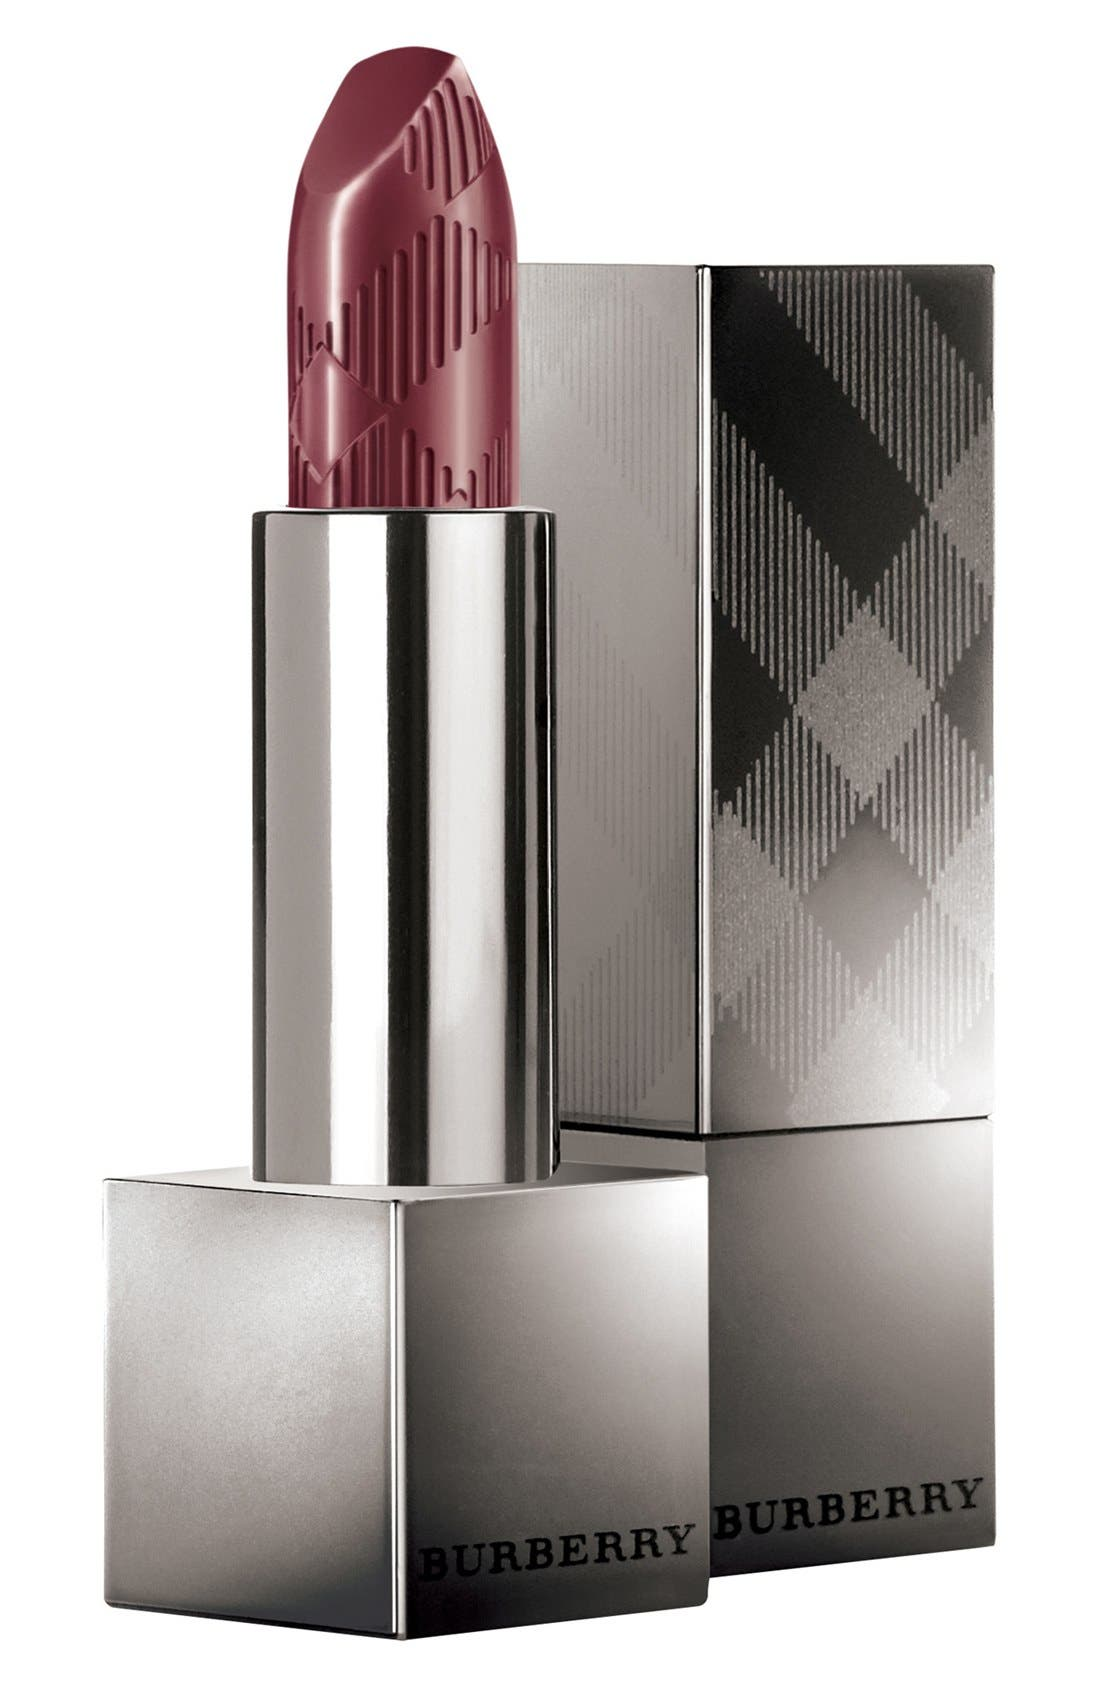 Burberry Beauty Burberry Kisses Lipstick